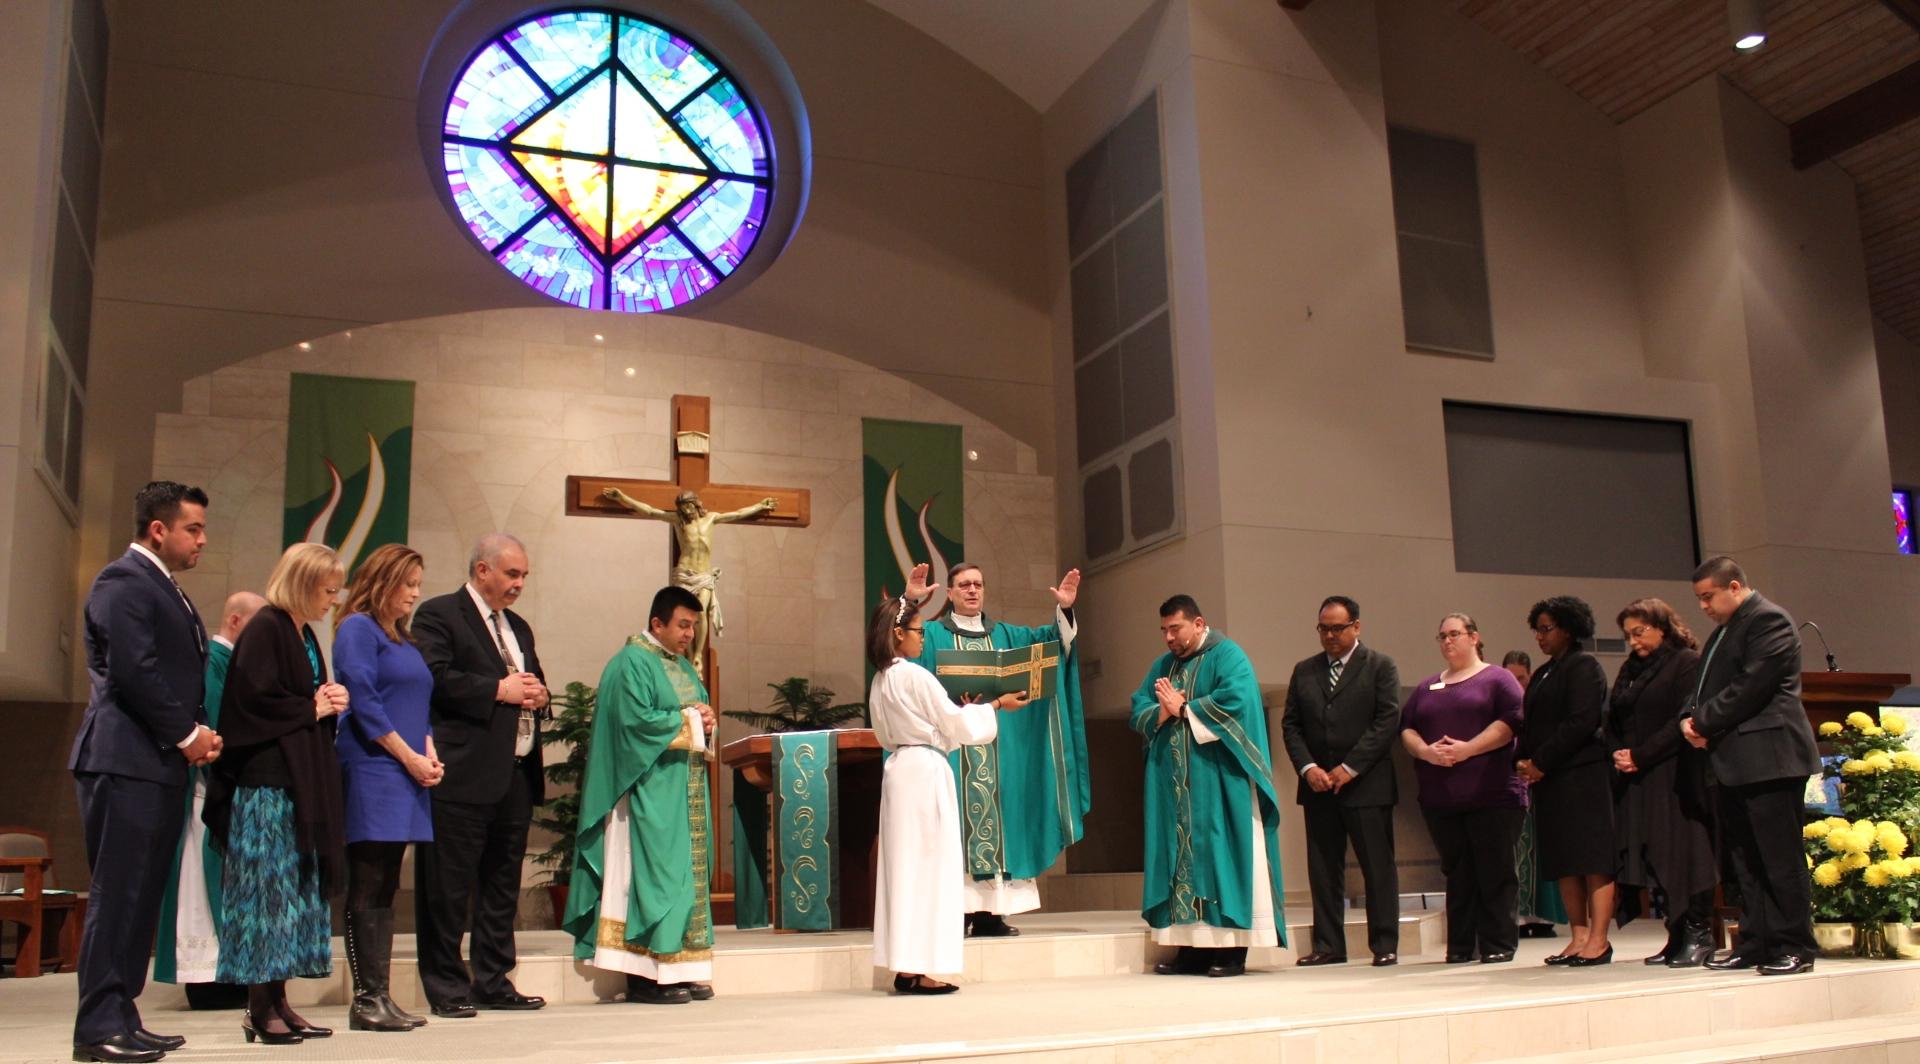 COVENANT RENEWAL MASS - JANUARY 26, 5:00 PM - MAIN CHURCH